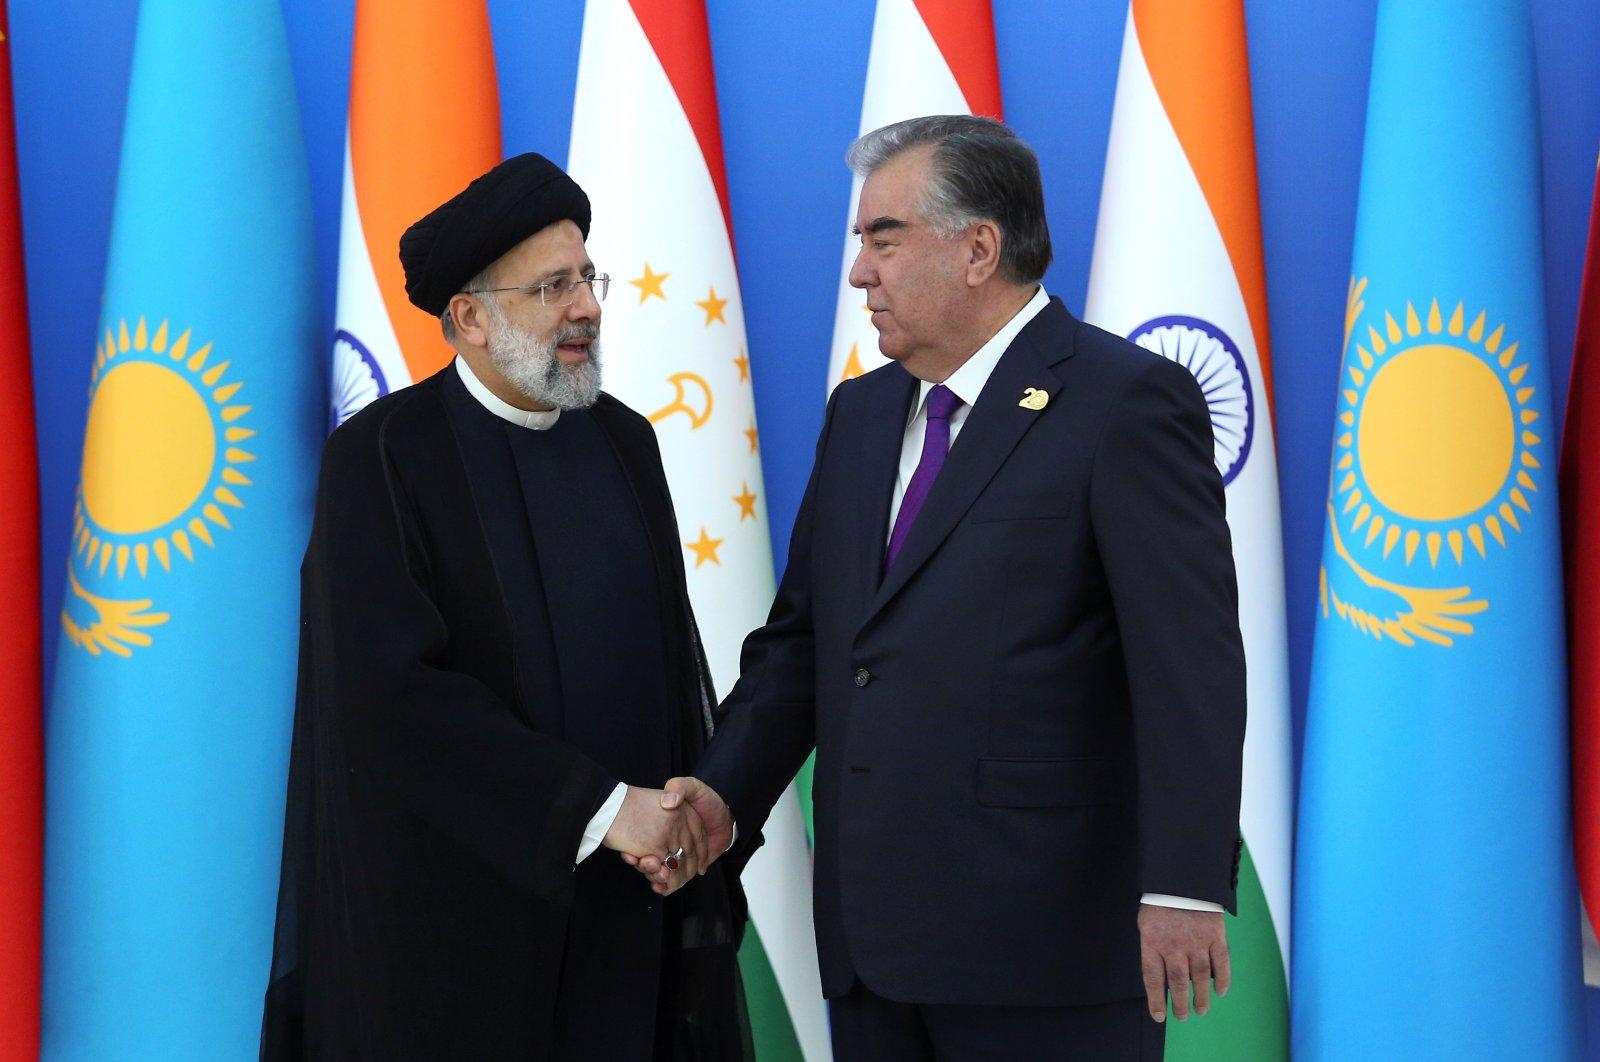 Tajik President Emomali Rakhmon shakes hands with Iranian President Ebrahim Raisi during the Shanghai Cooperation Organization (SCO) summit in Dushanbe, Tajikistan, Sept. 17, 2021. (Reuters Photo)